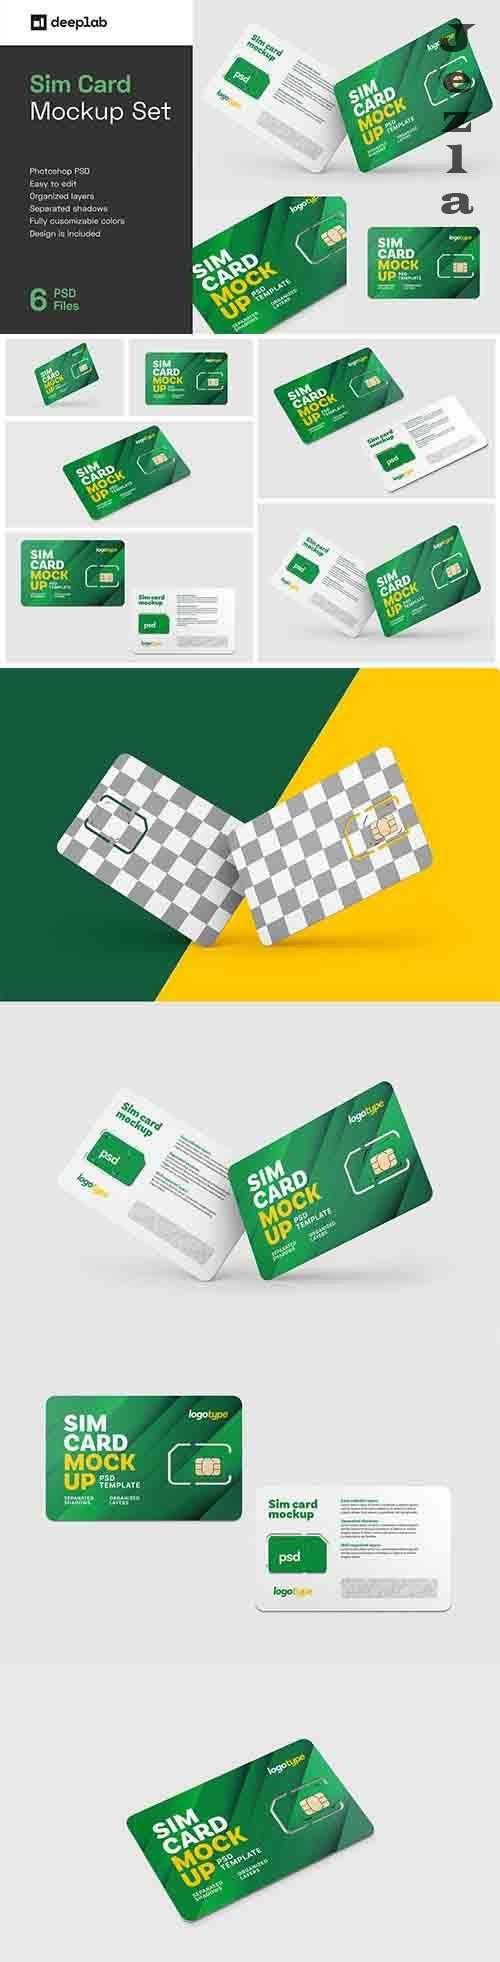 Sim Card Mockup Set 6061364